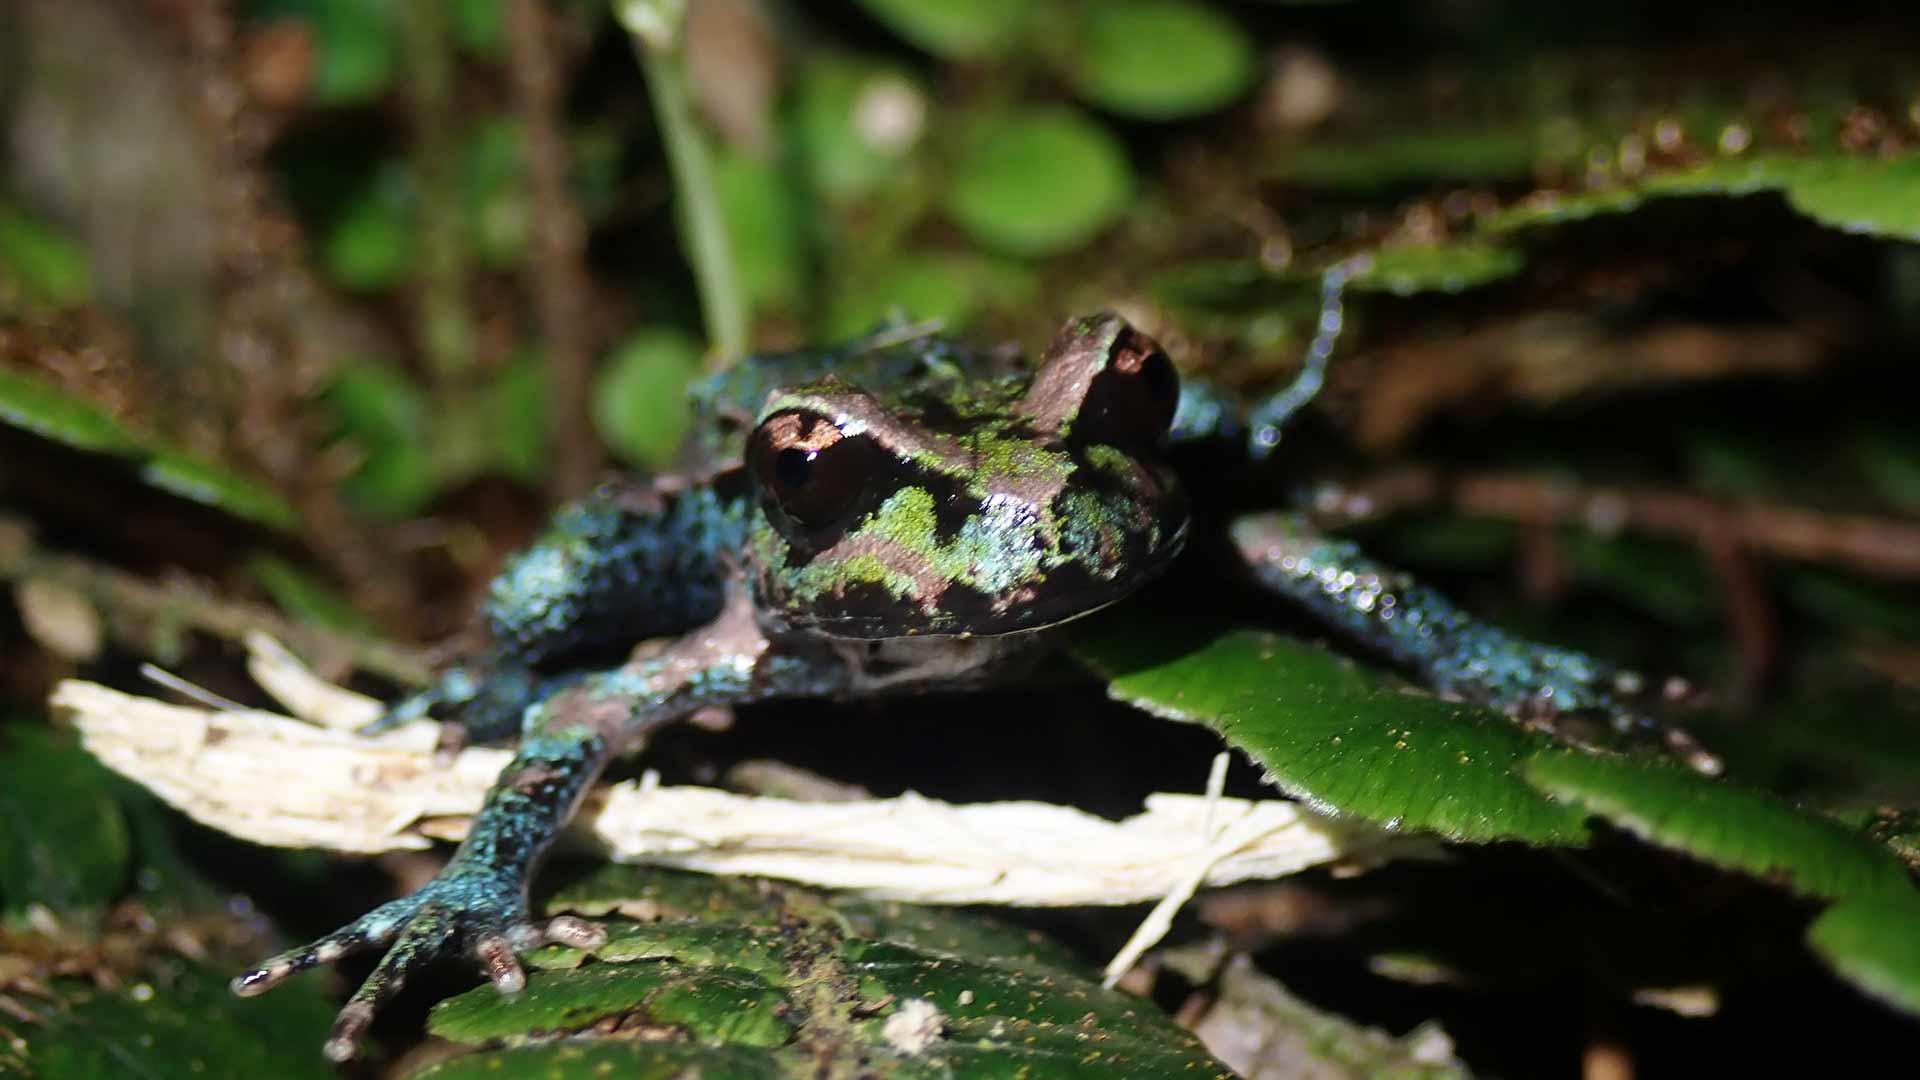 https://rfacdn.nz/zoo/assets/media/archeys-frog-gallery-1-emily.jpg